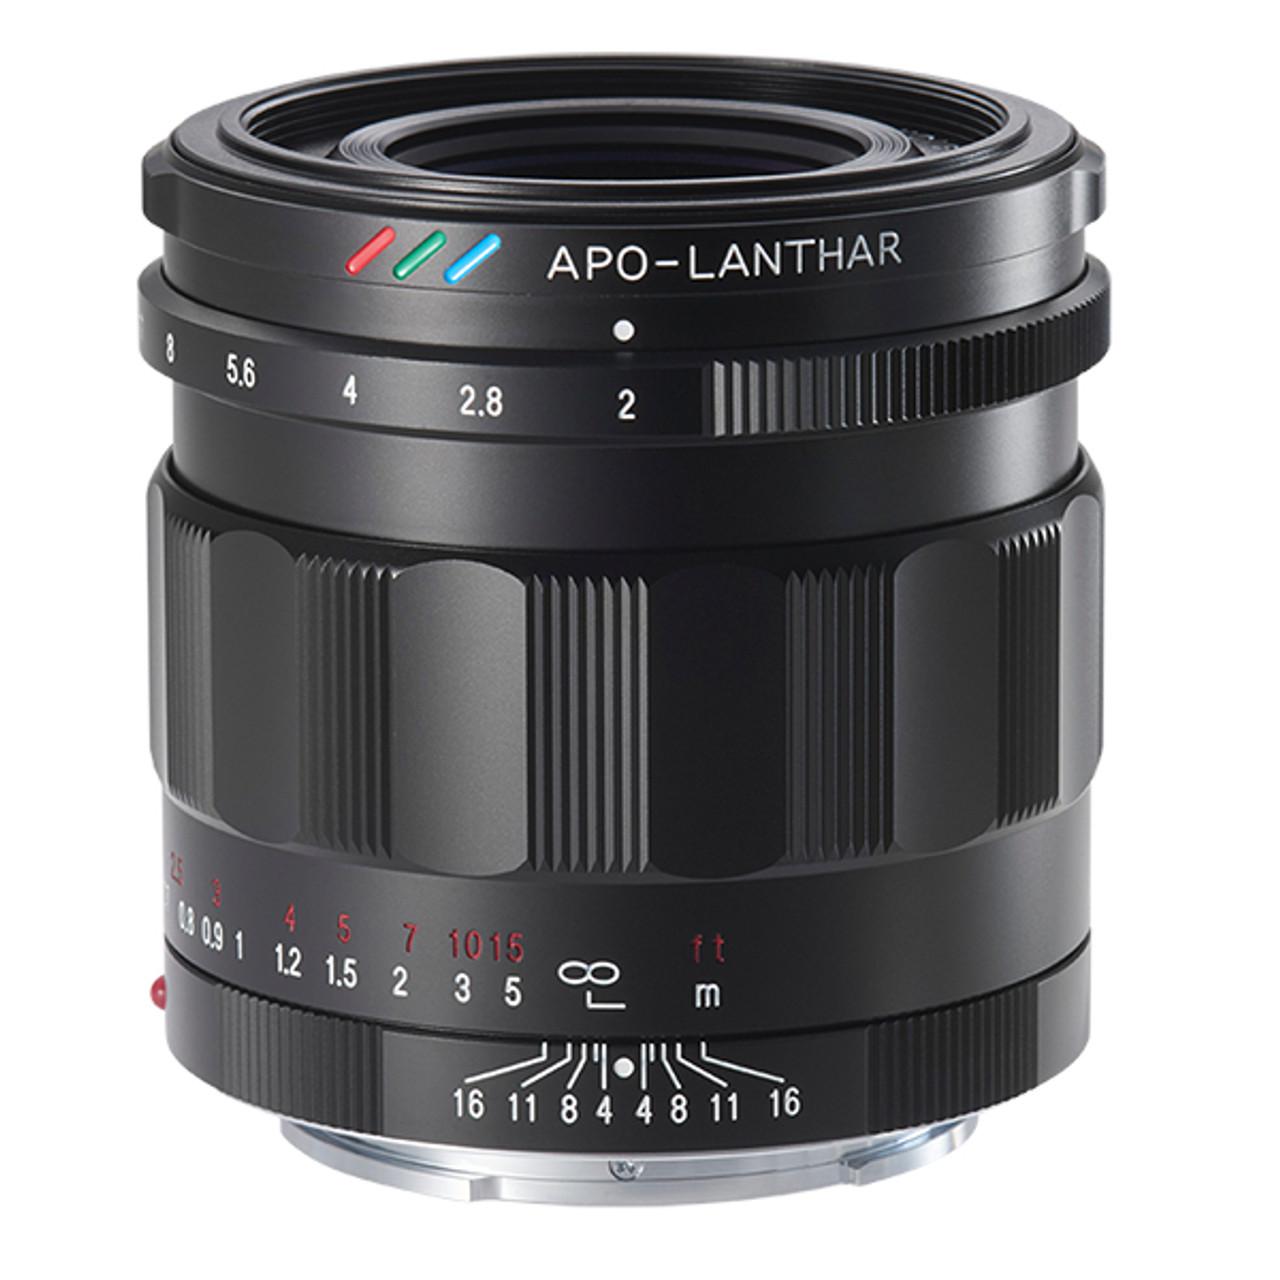 Voigtlander 50mm F2 E APO-LANTHAR